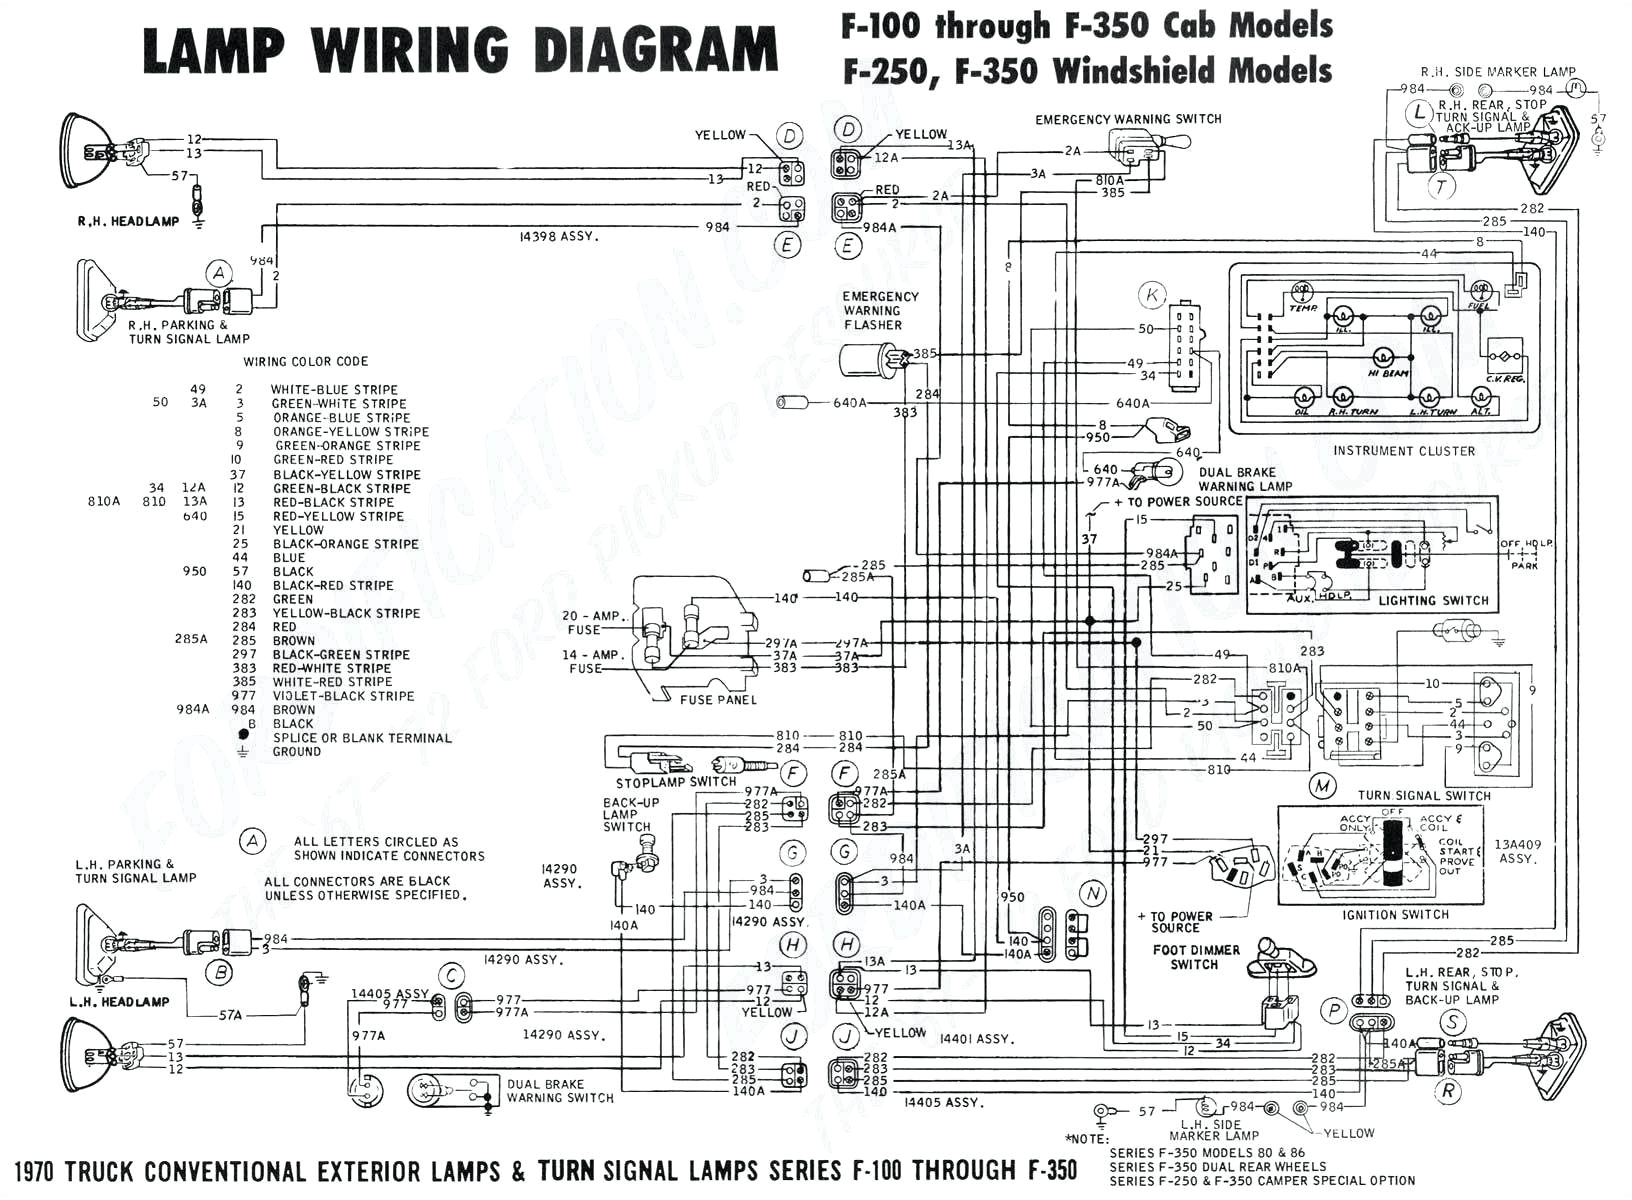 ford f 250 electrical diagram wiring diagram expert 2016 ford f250 wiring diagram 2000 ford f